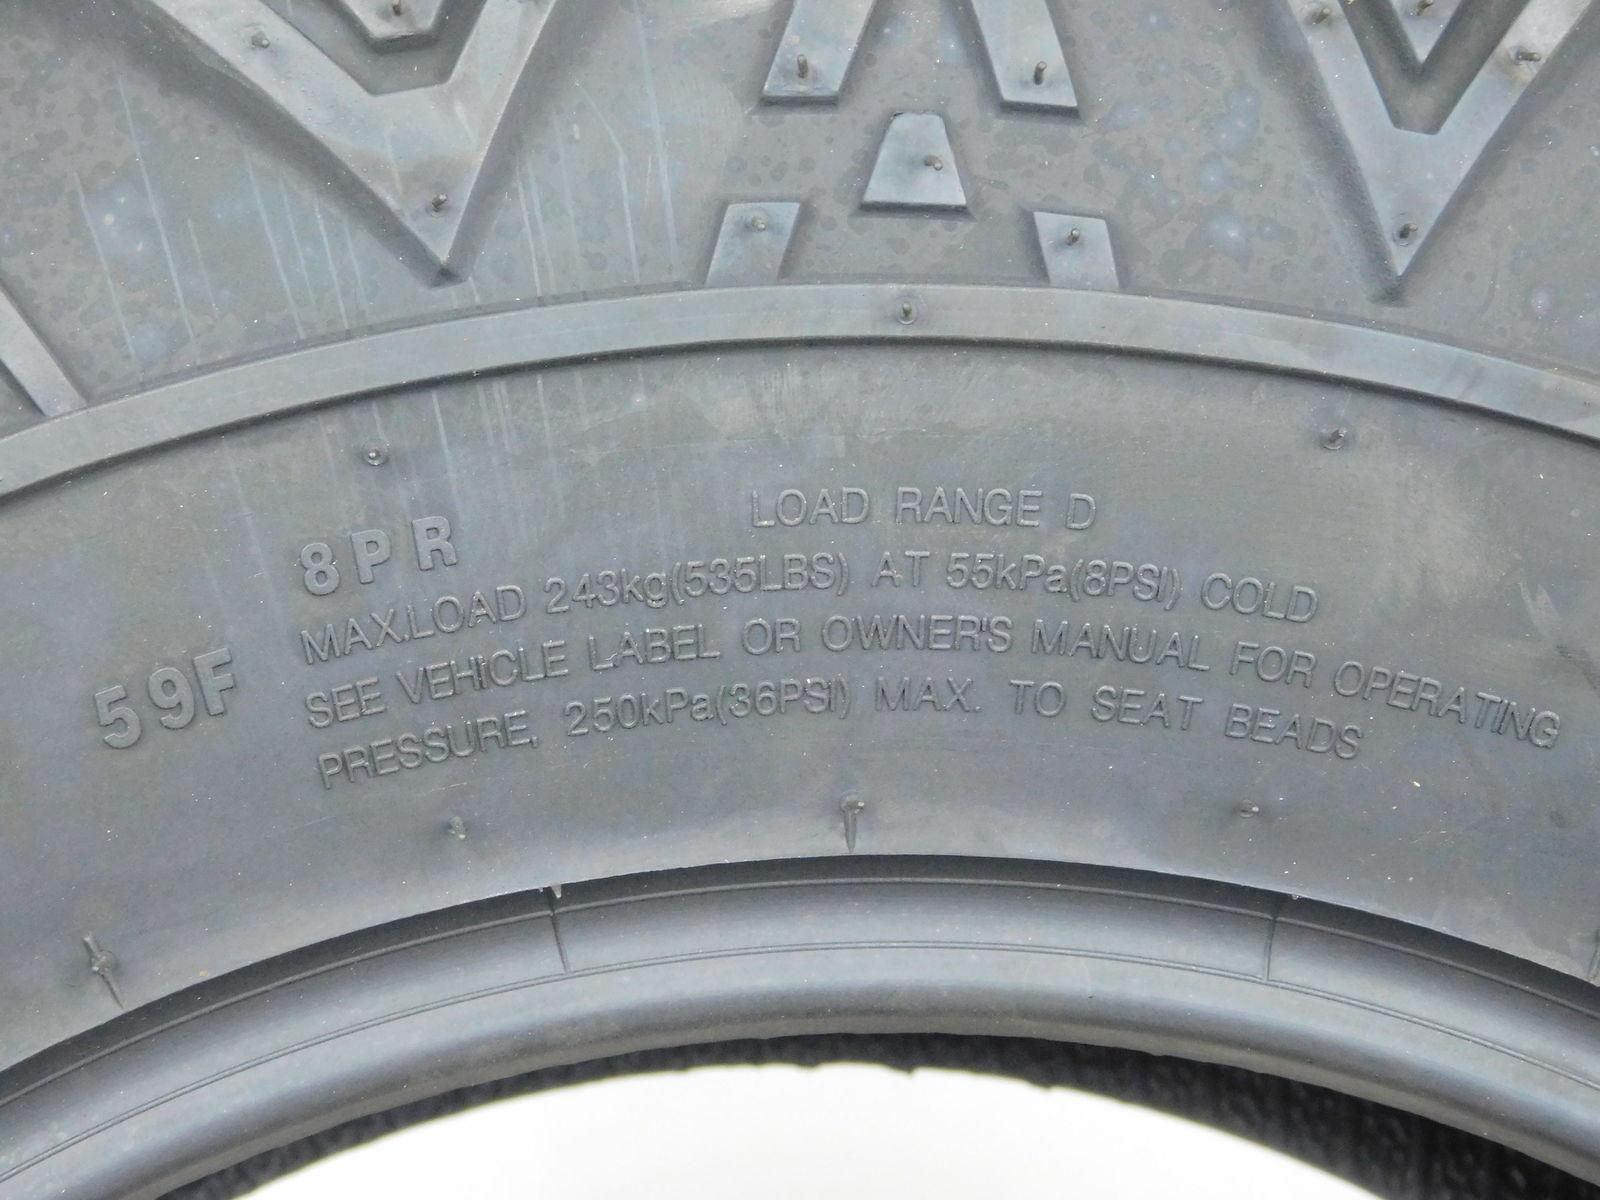 Arisun-28x10-14-Tires-Bruiser-XT-RADIAL-8ply-255-70R14-N4D-Protection-image-5